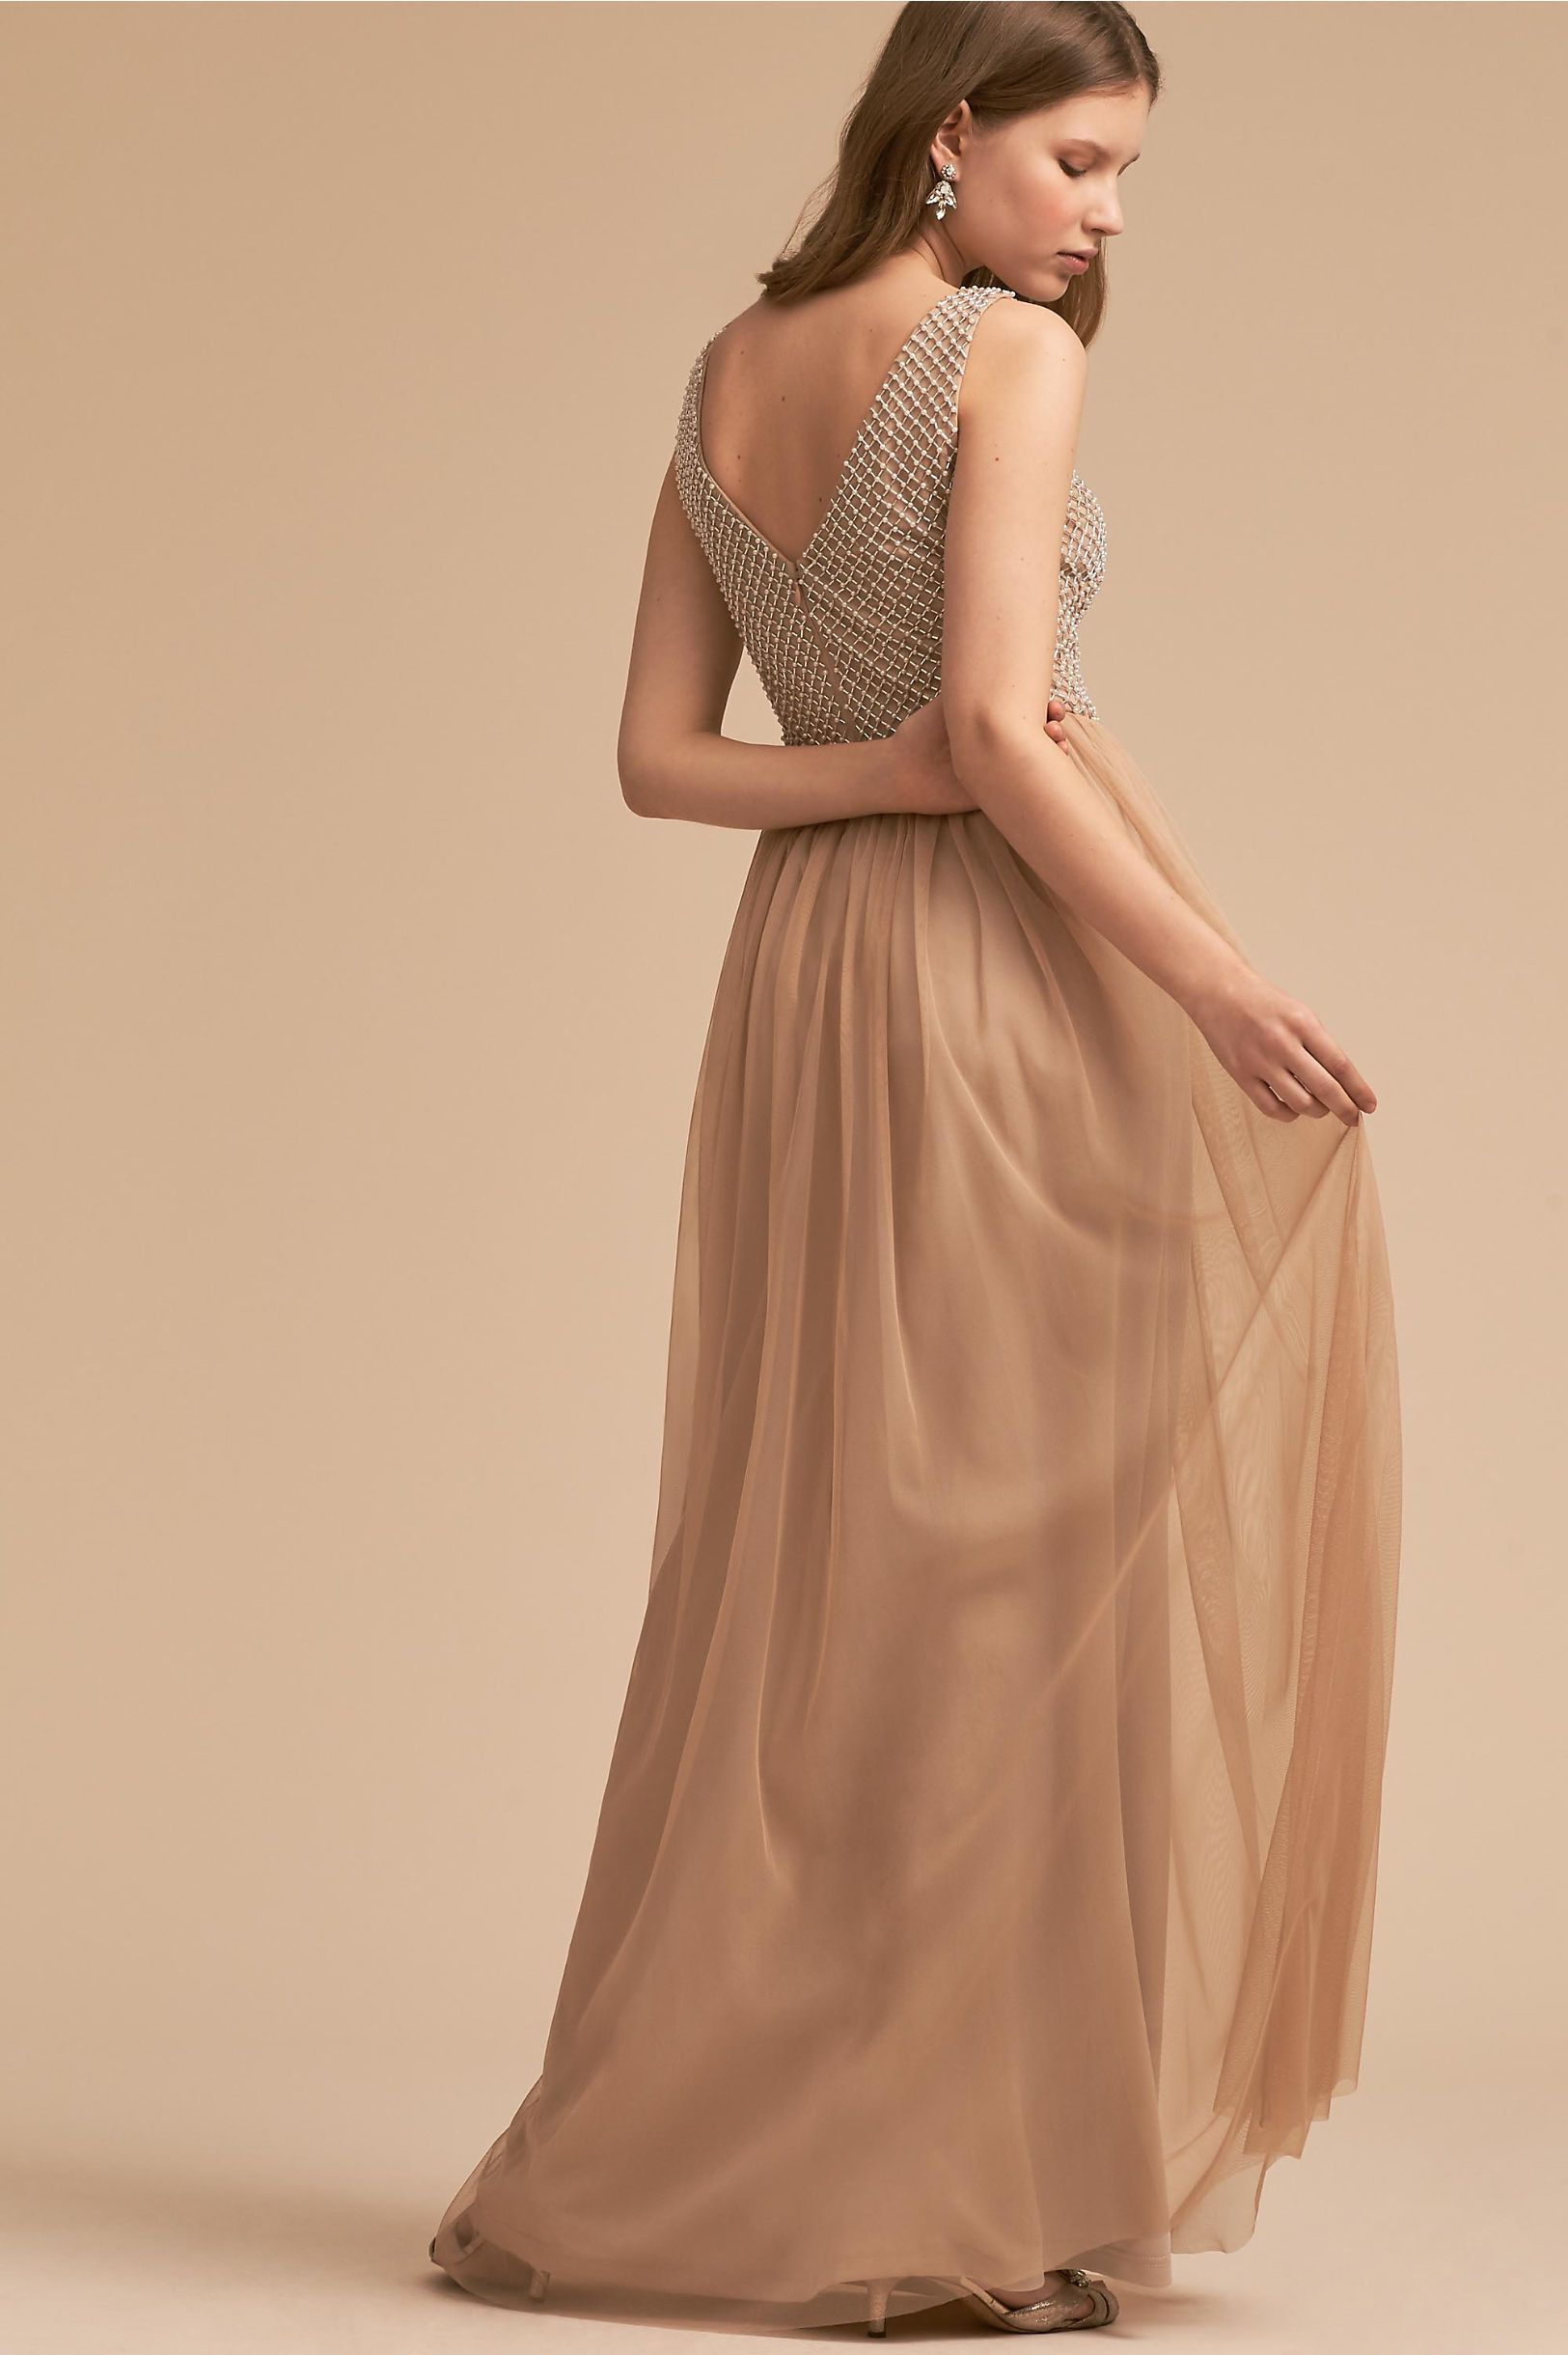 0817b6bdd49 Bryce Dress Champagne in Bridal Party